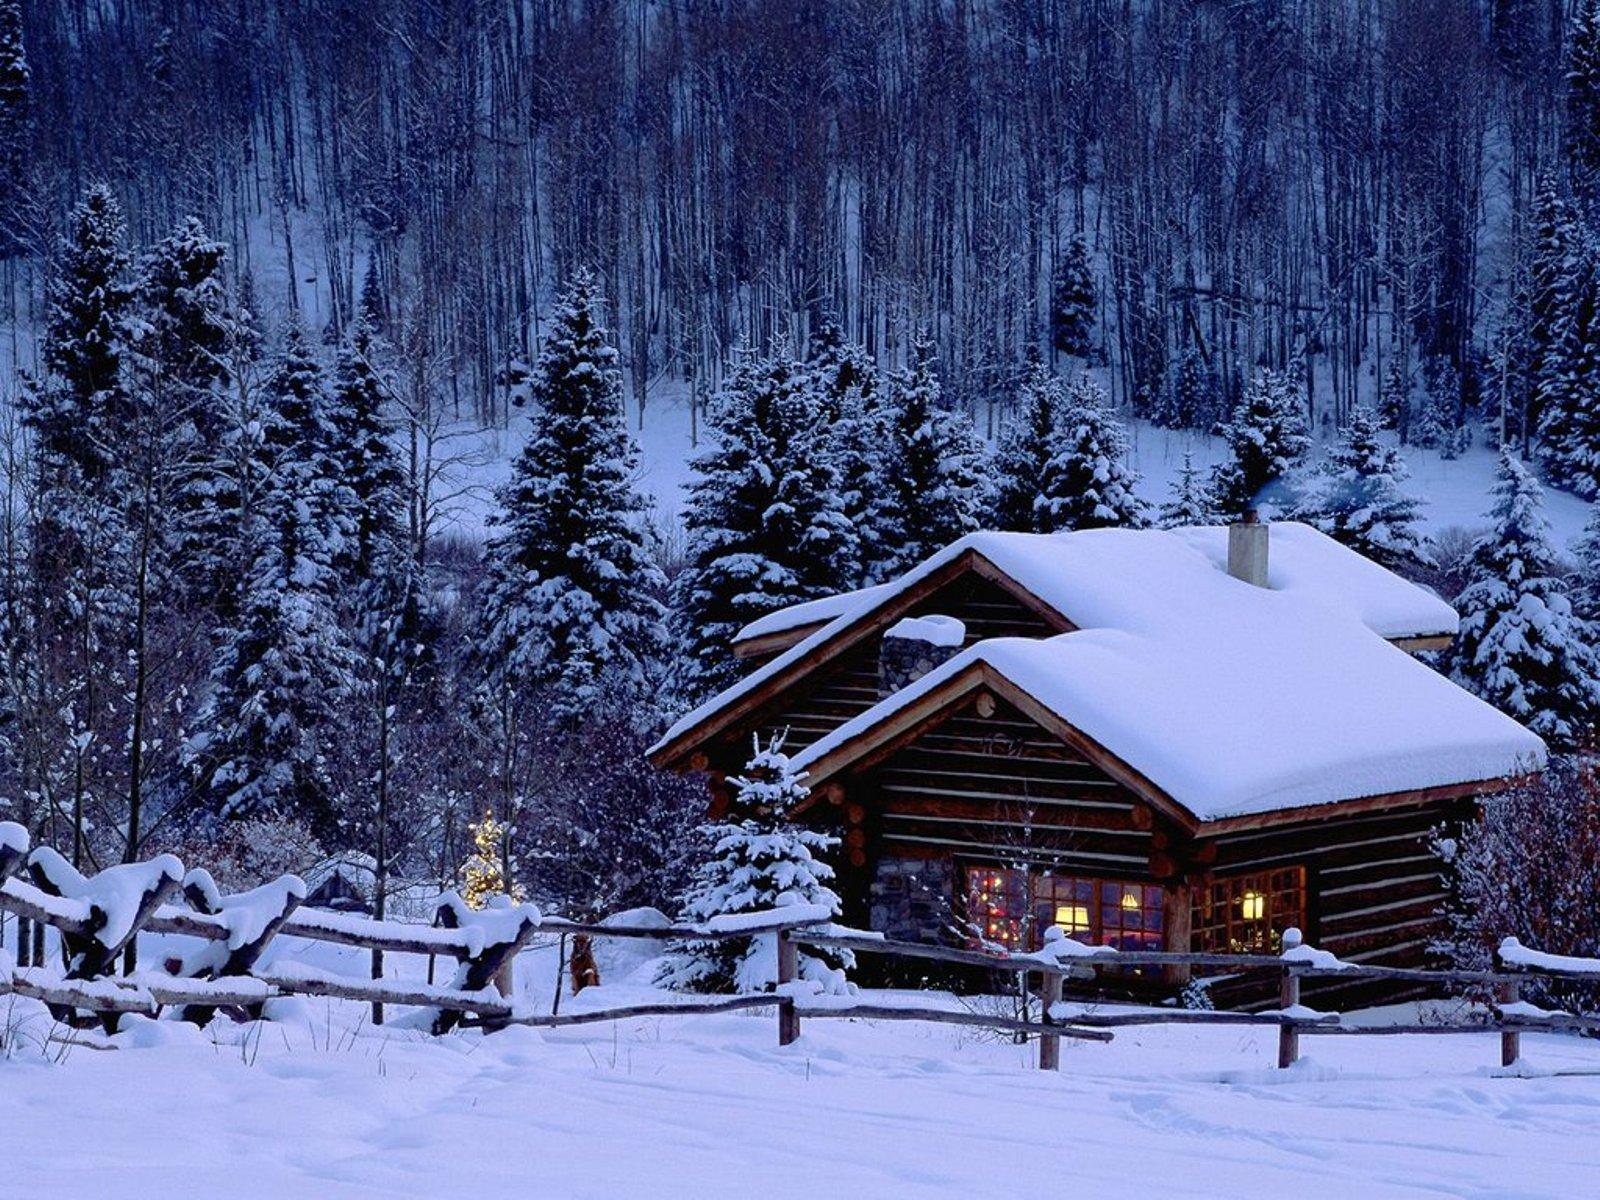 wallpaper of winter season in hd wallpaper images